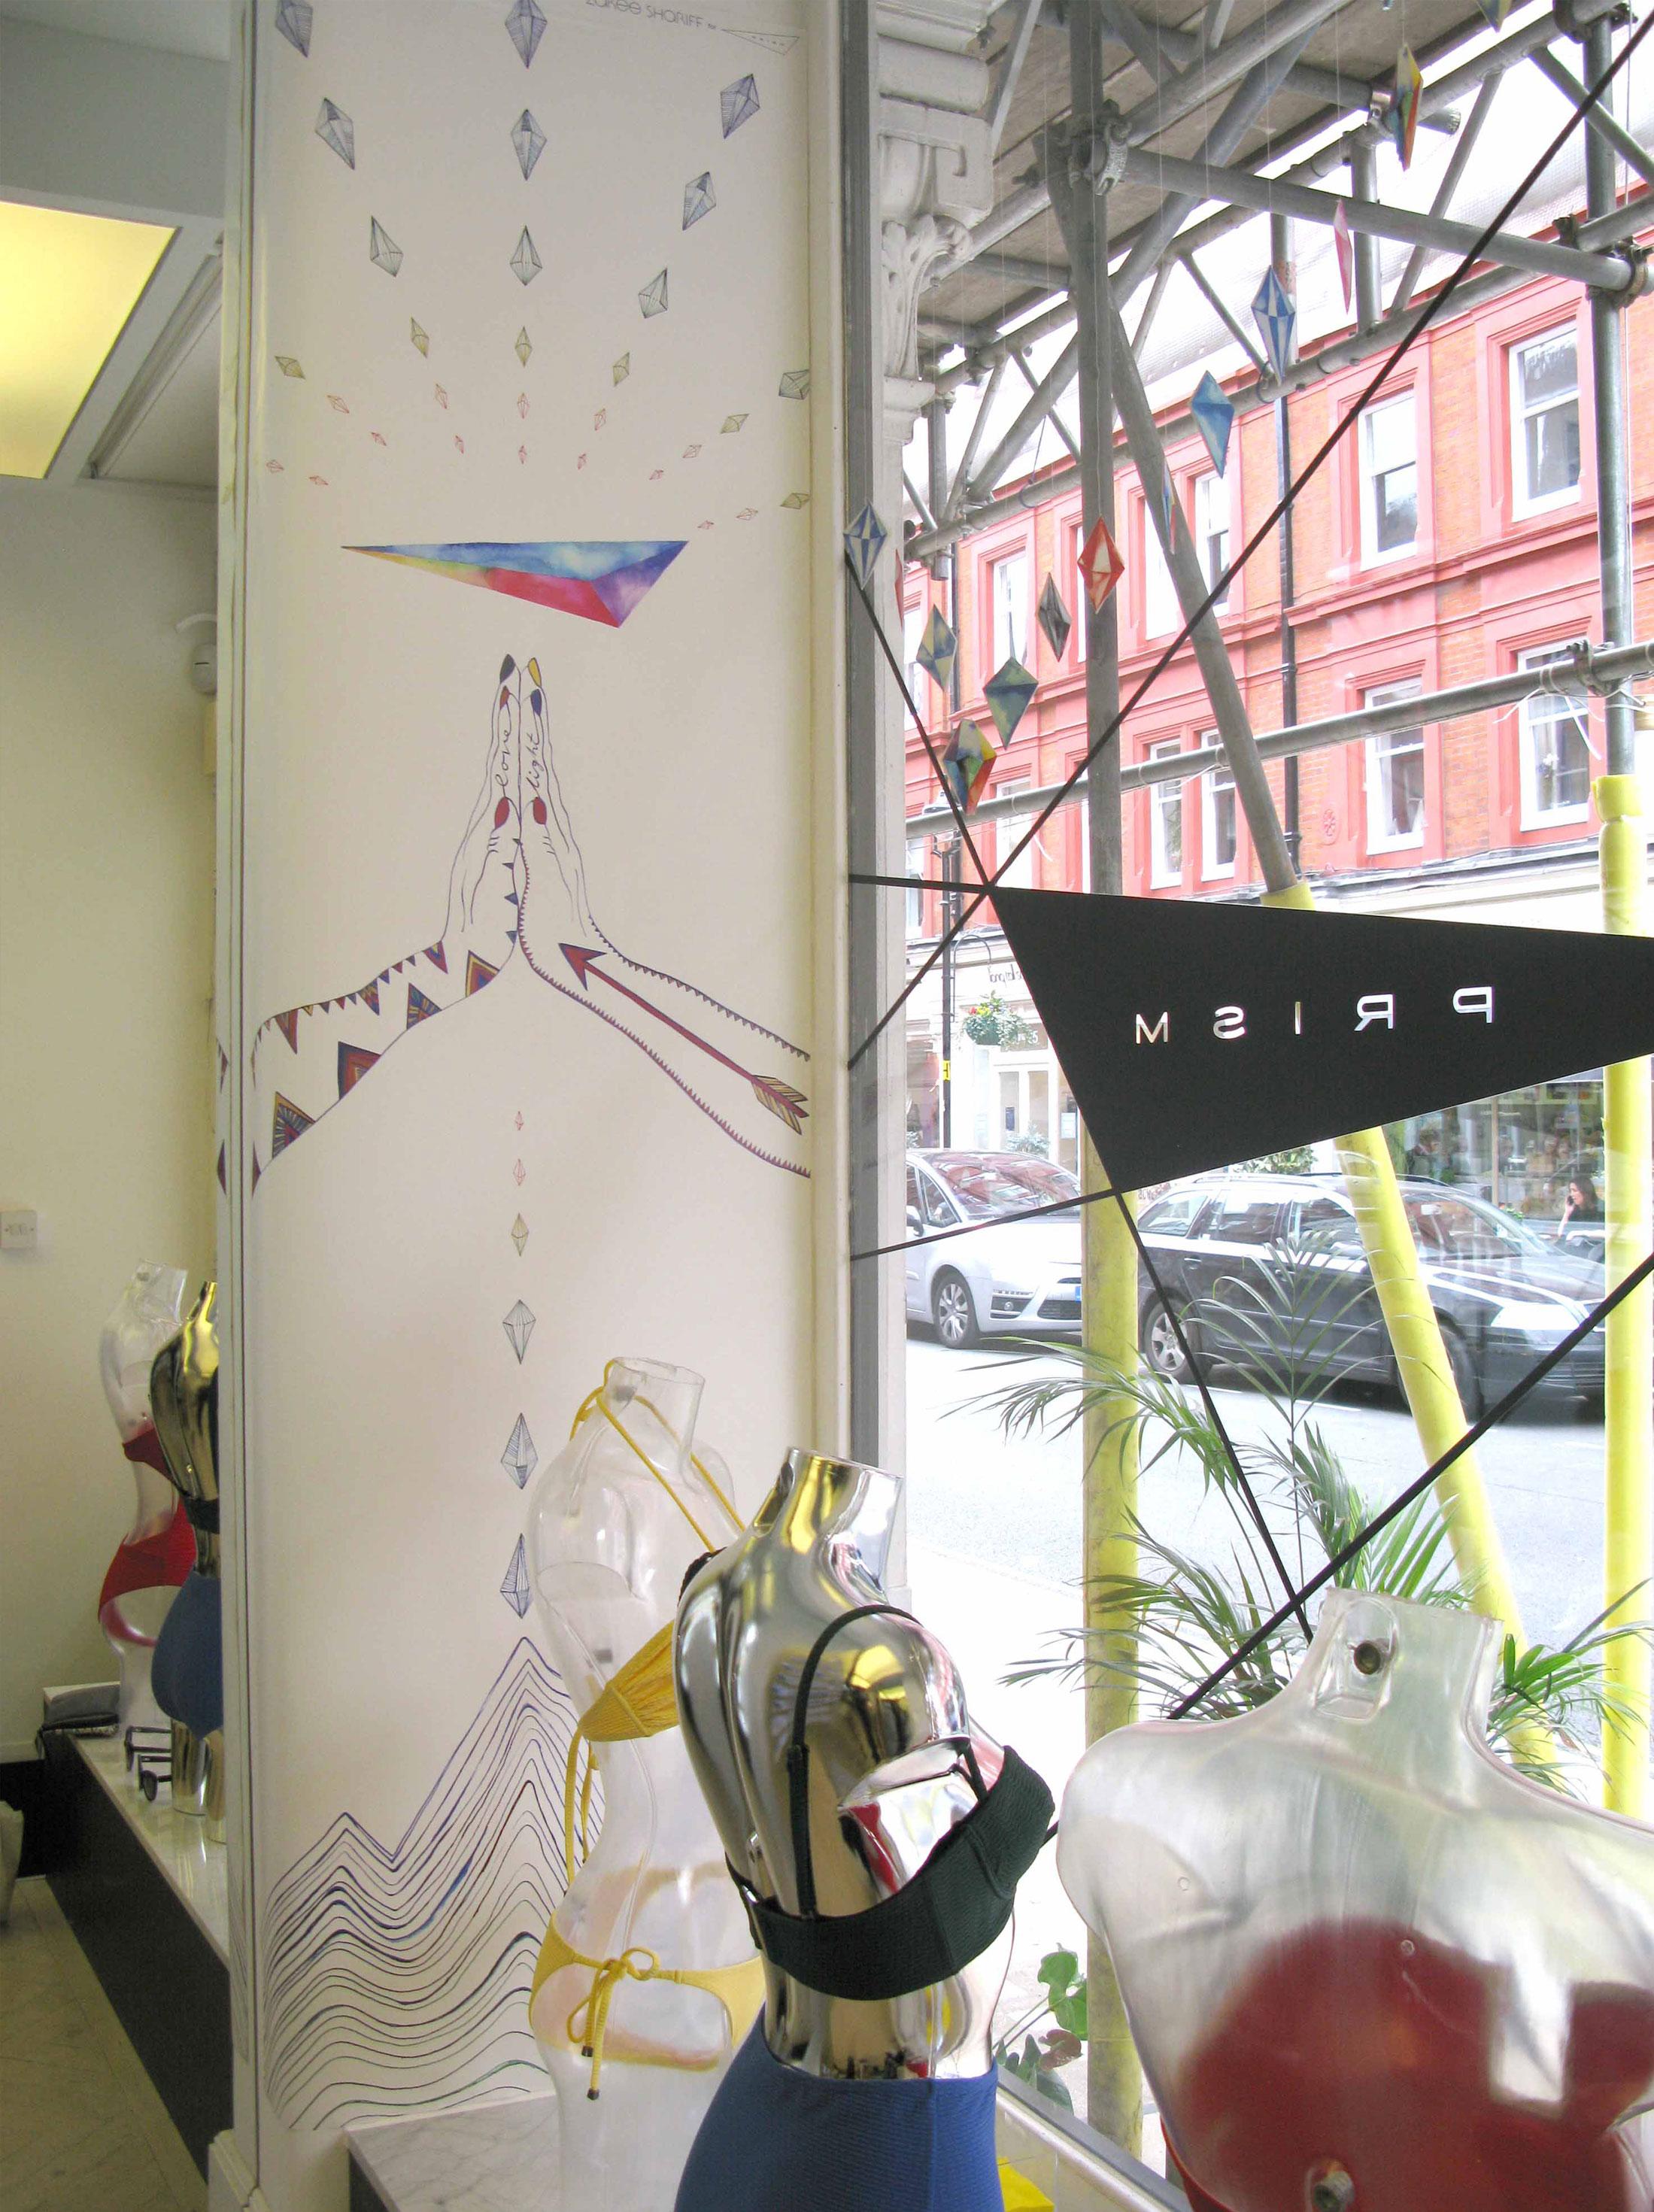 Interior shot of the window